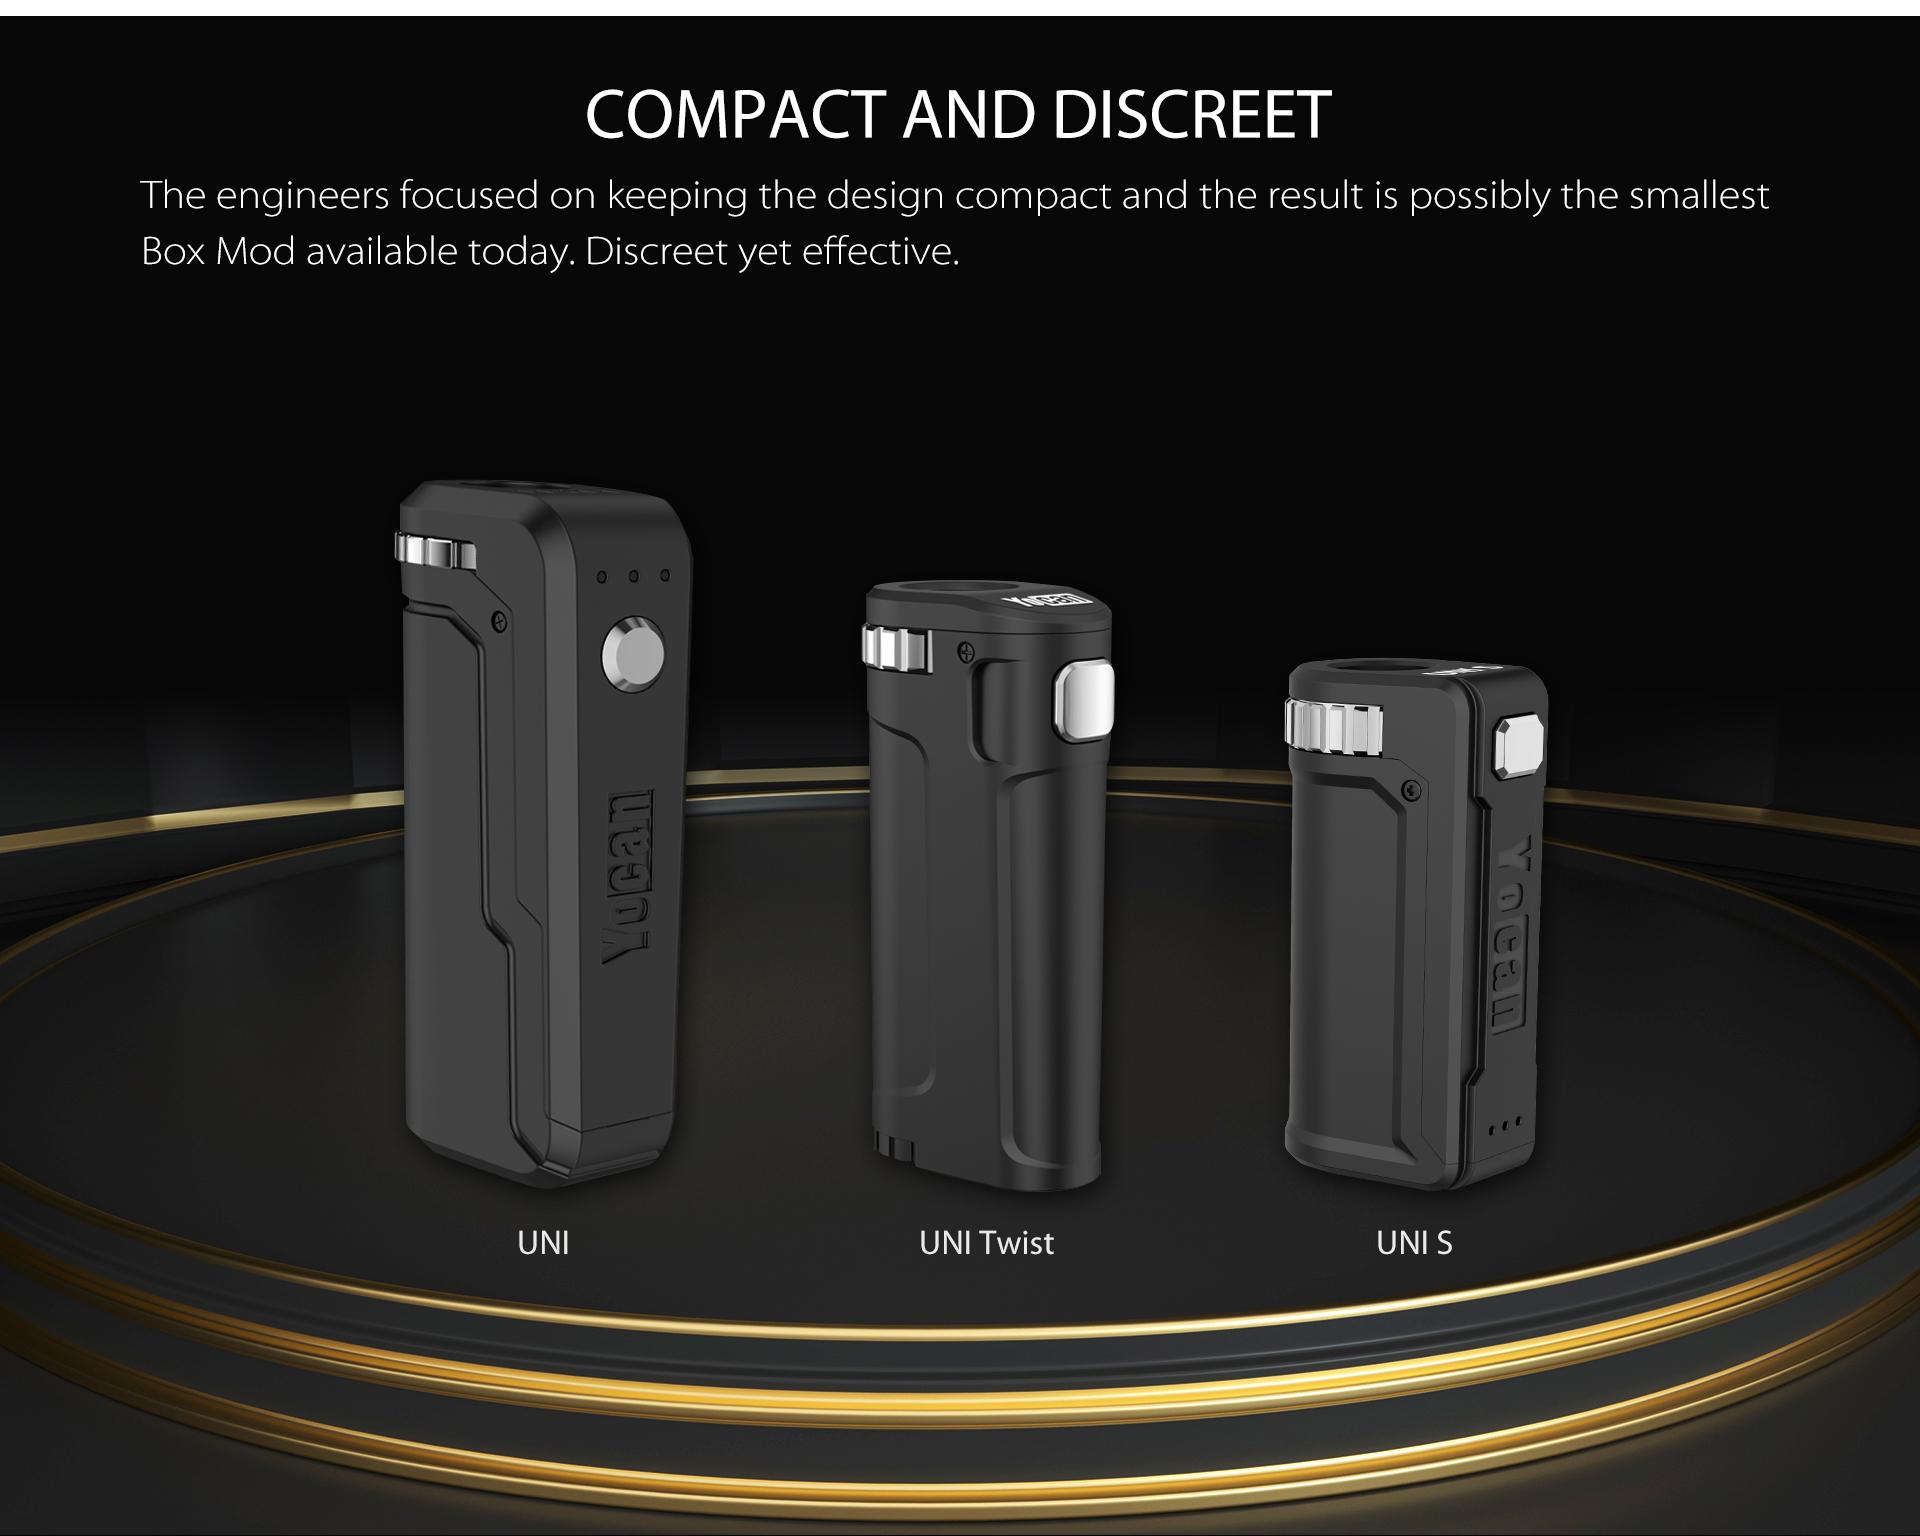 Yocan UNI Twist Universal Portable Mod is compact and discreet.